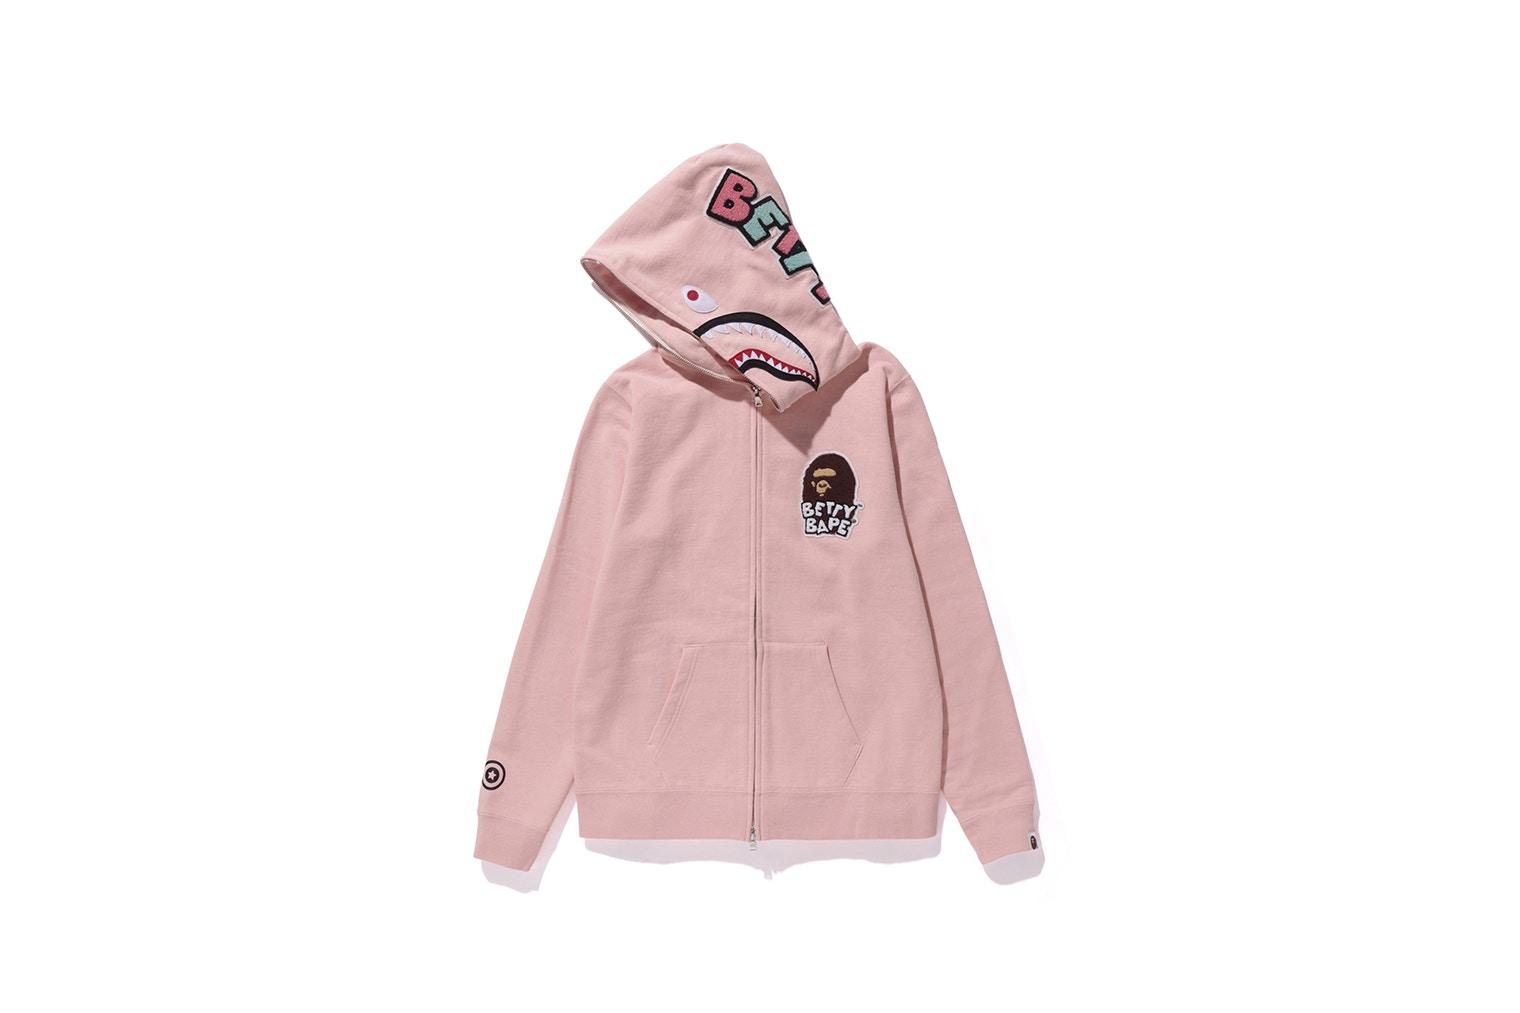 http-bae-hypebeast-comfiles201710betty-boop-bape-collection-hoodie-b